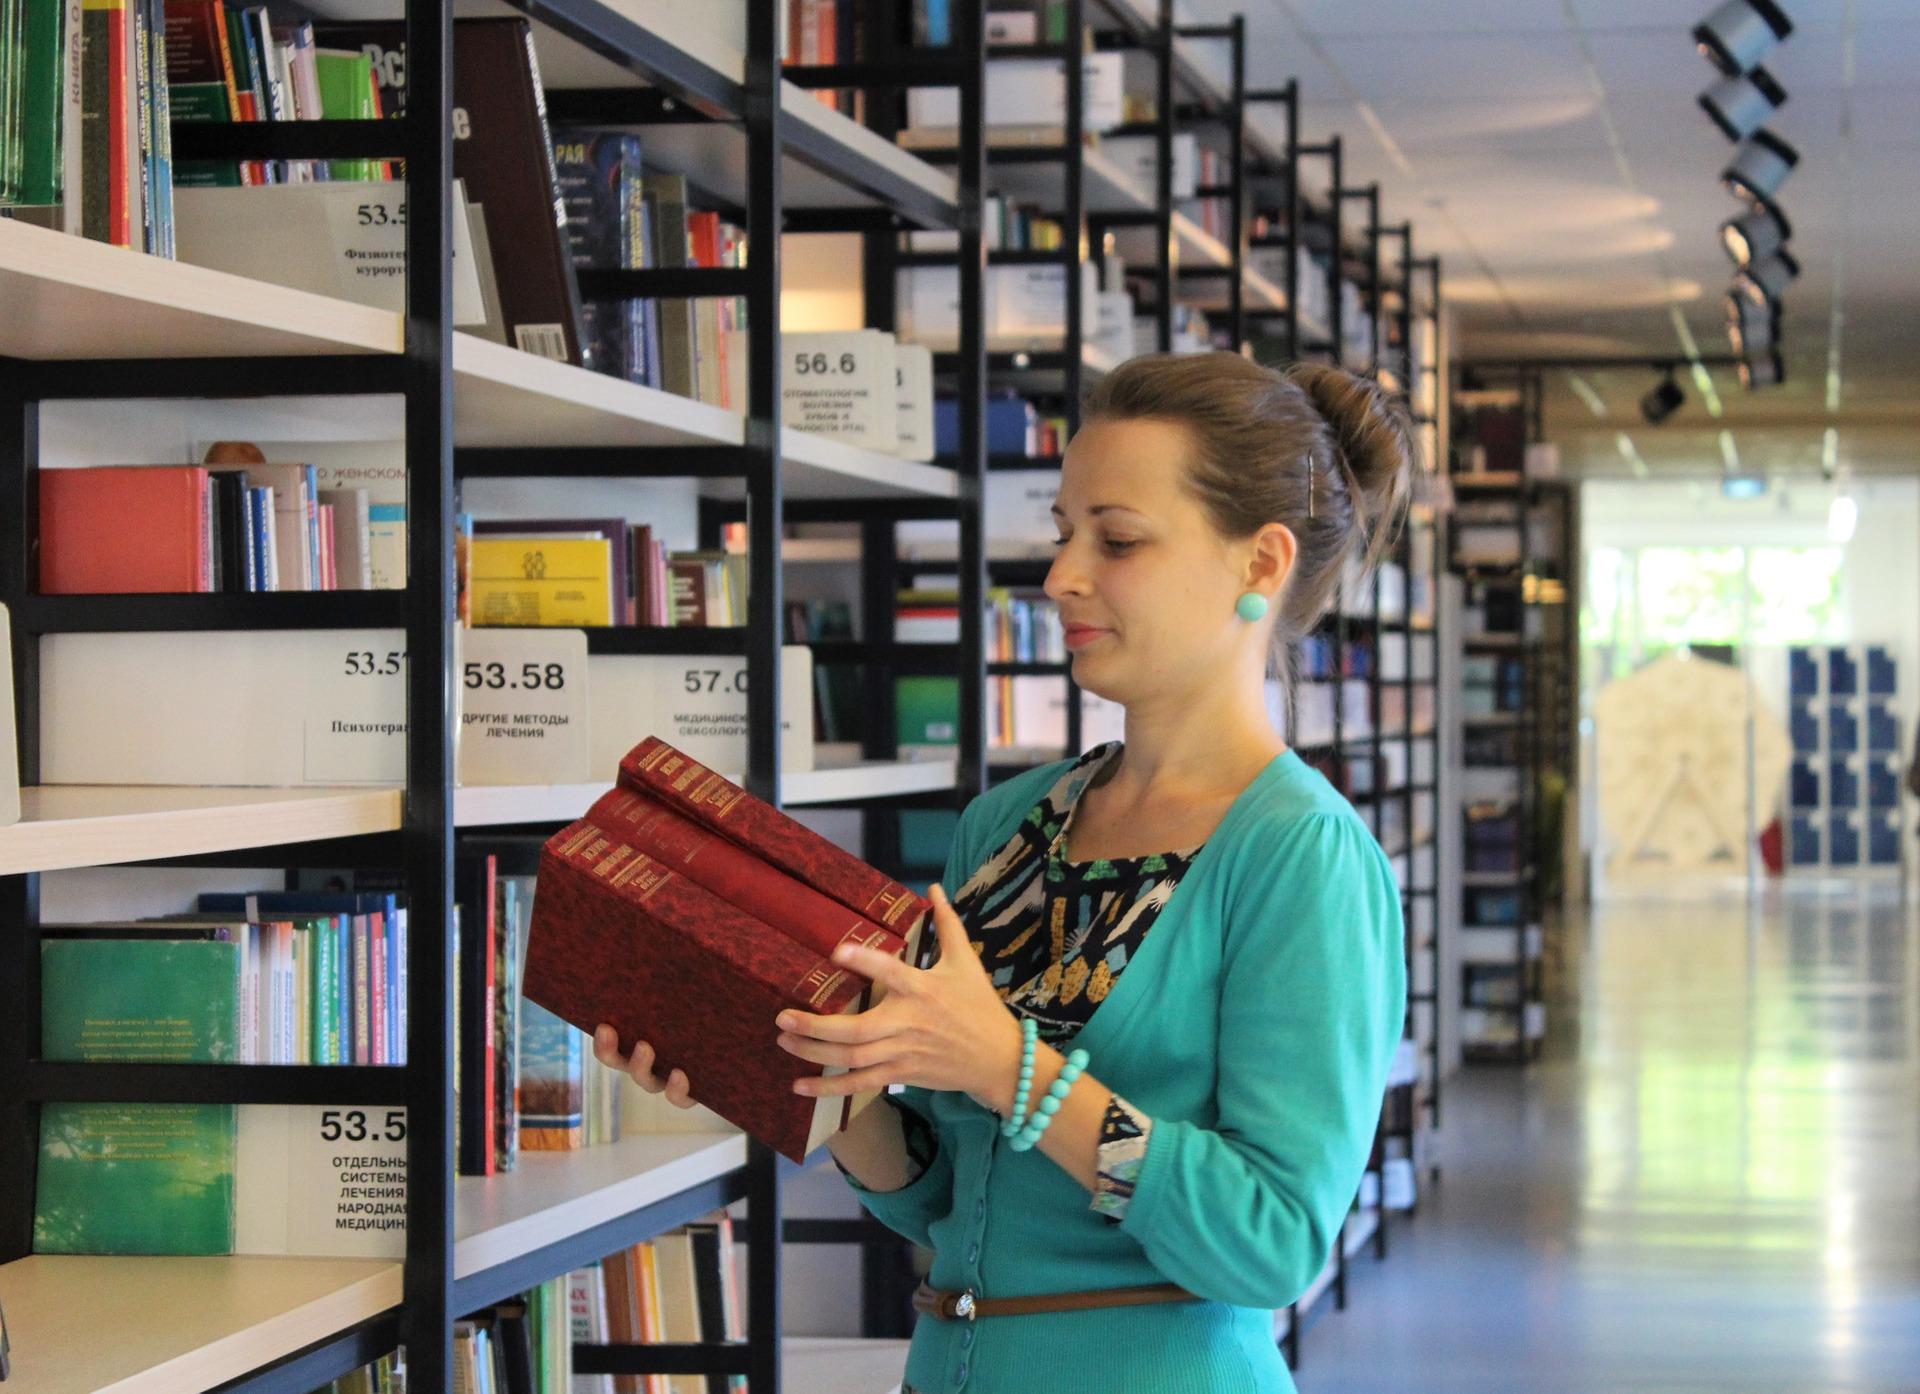 Biblioteche in Alto Adige